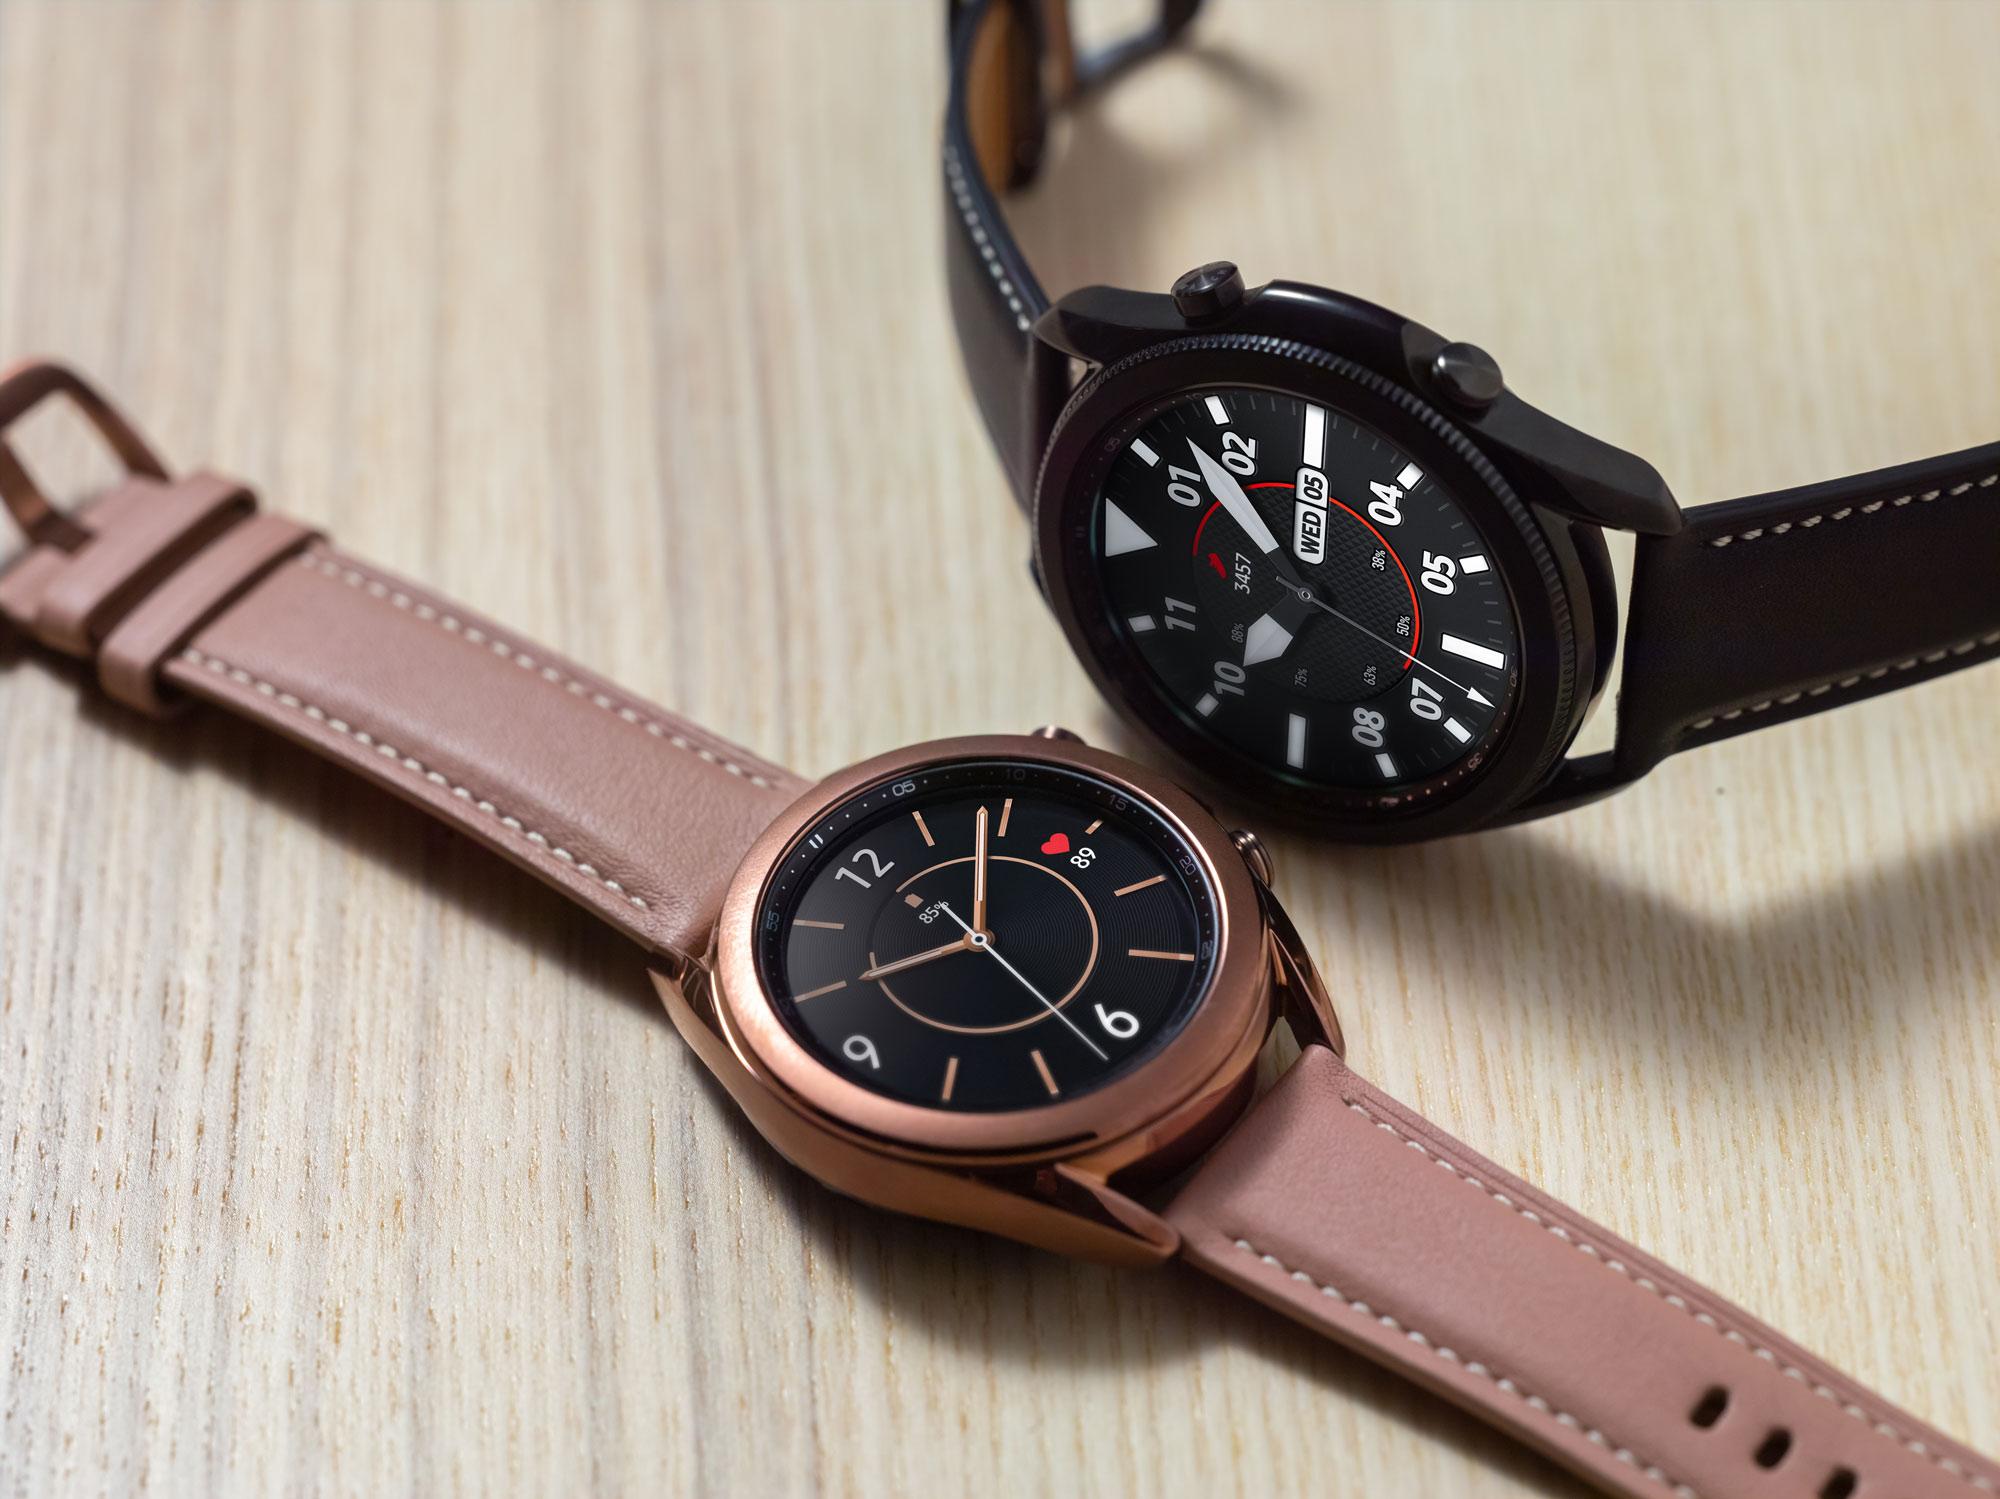 Samsung Galaxy Watch 3: Full Details & Launch Date Now ...  |Galaxy Watch 3